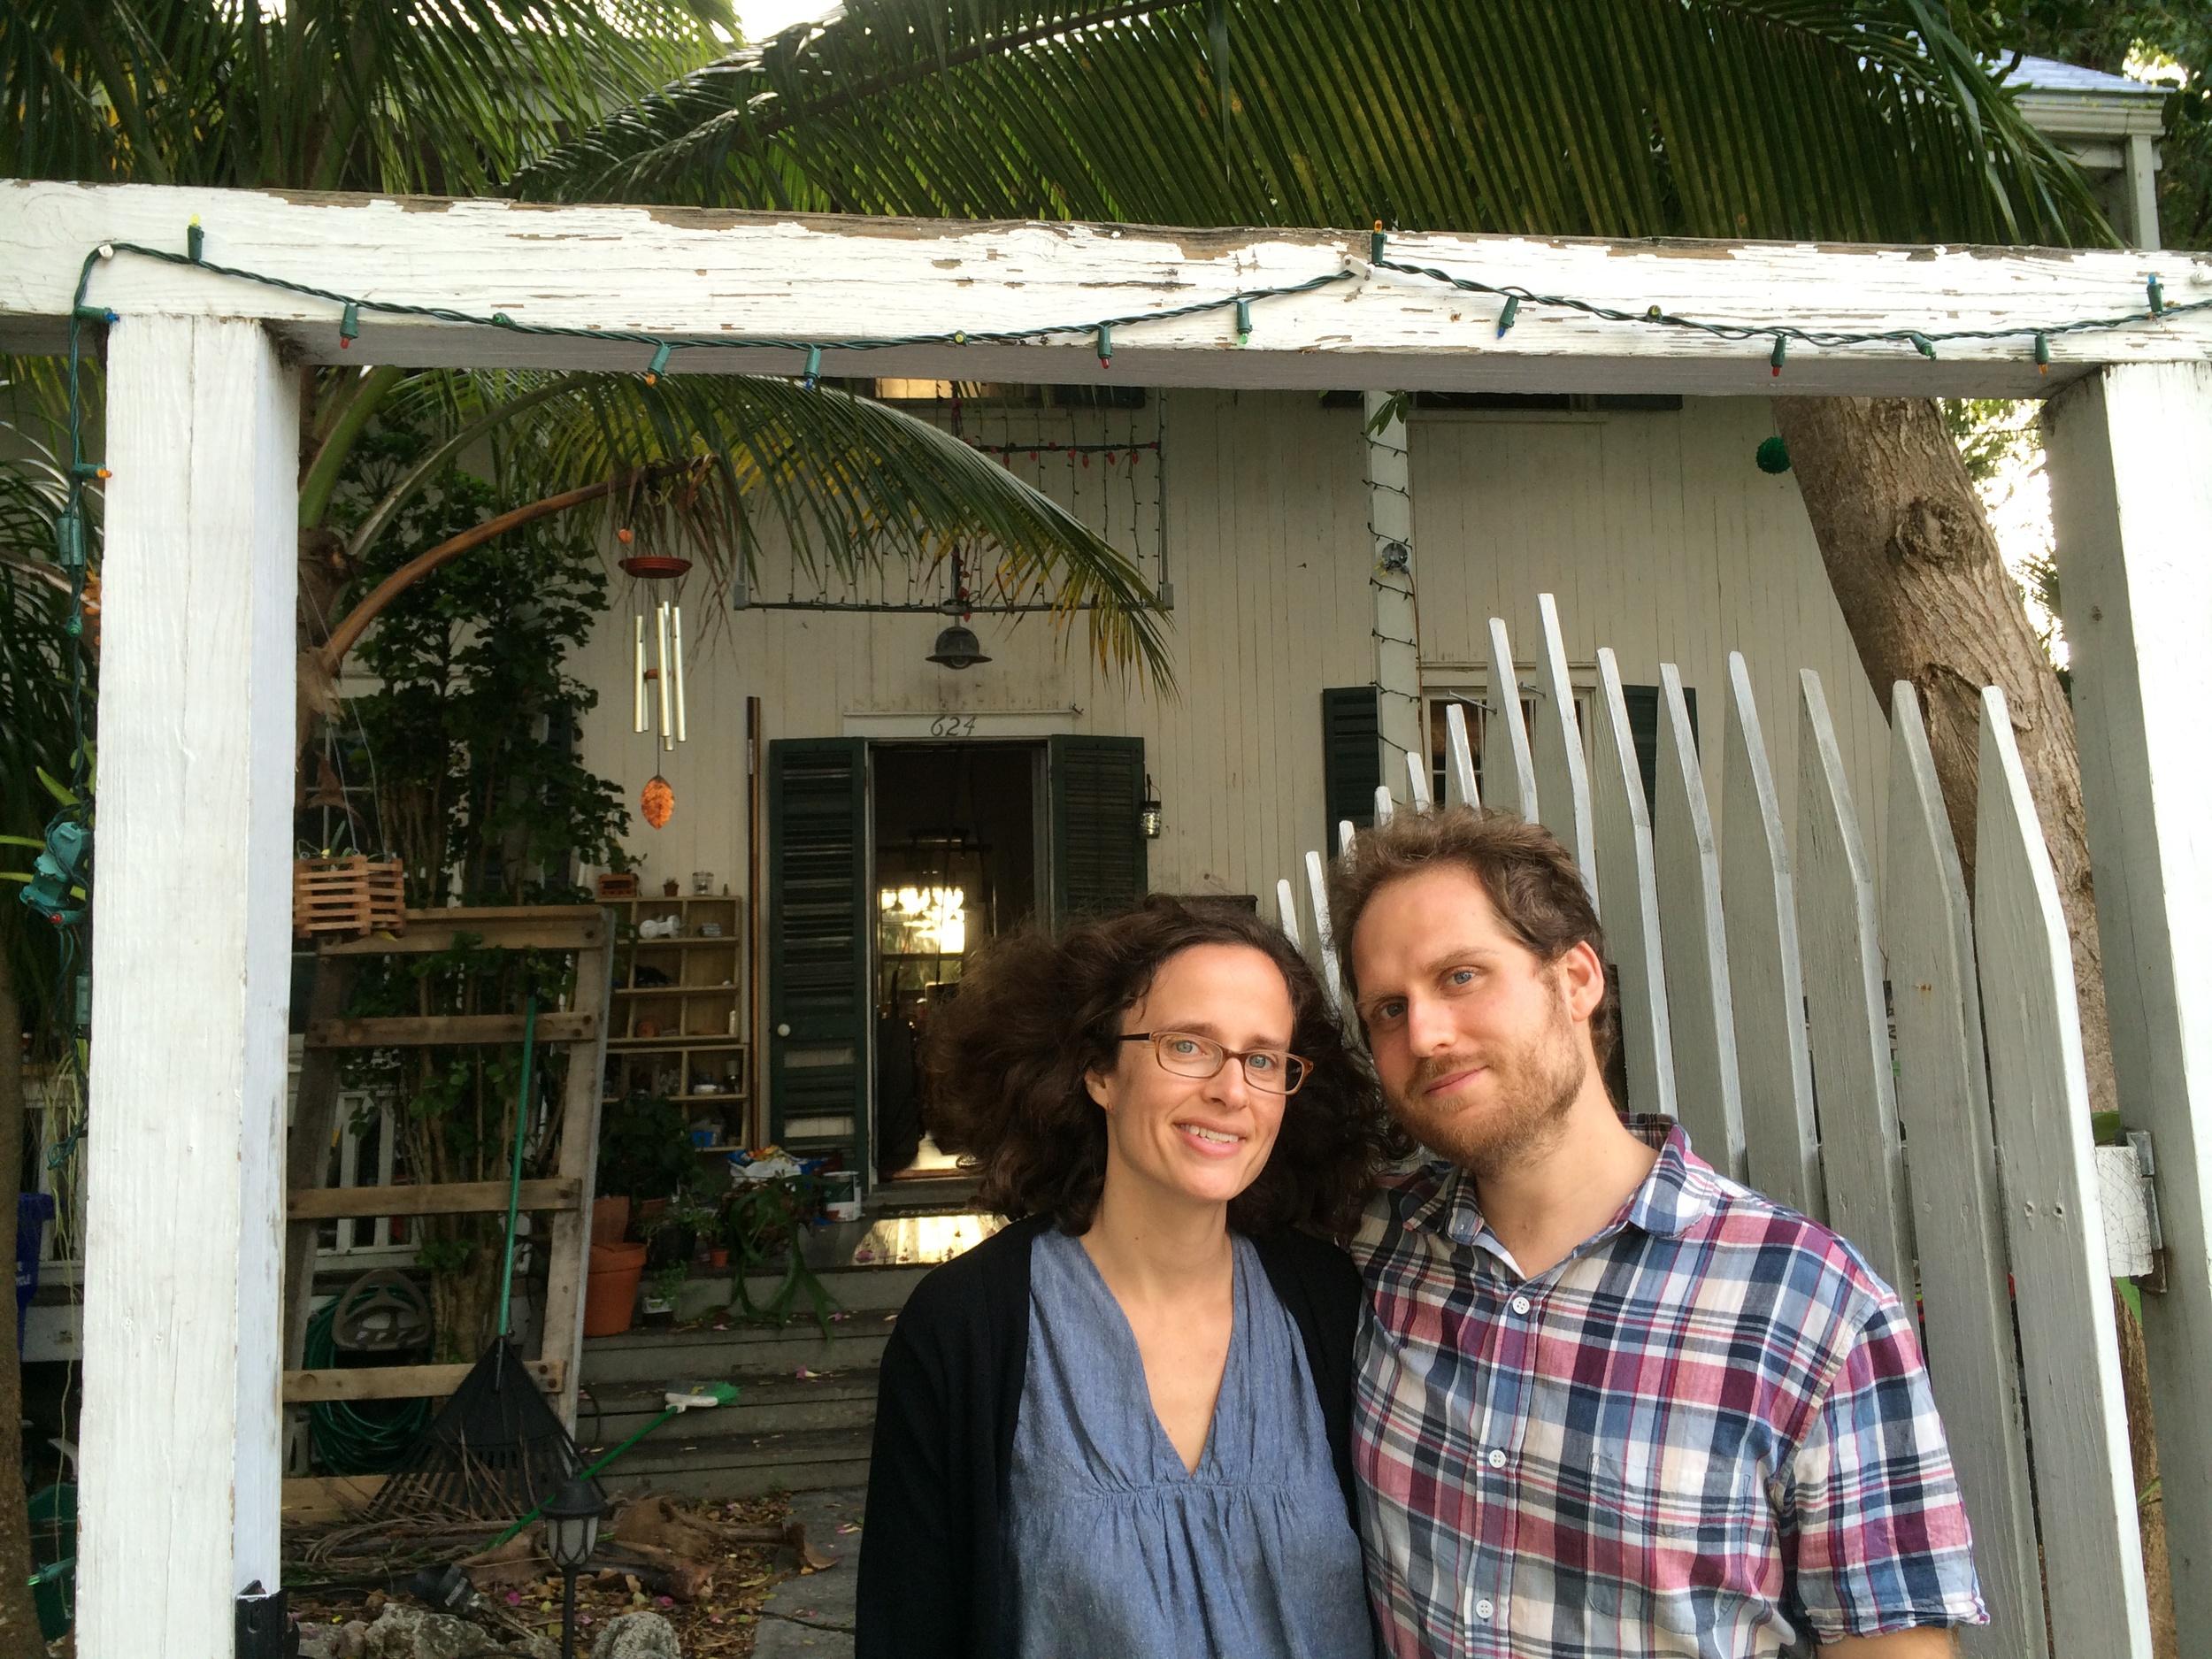 Jared and Farrah in front of Elizabeth Bishop's home in Key West, Florida